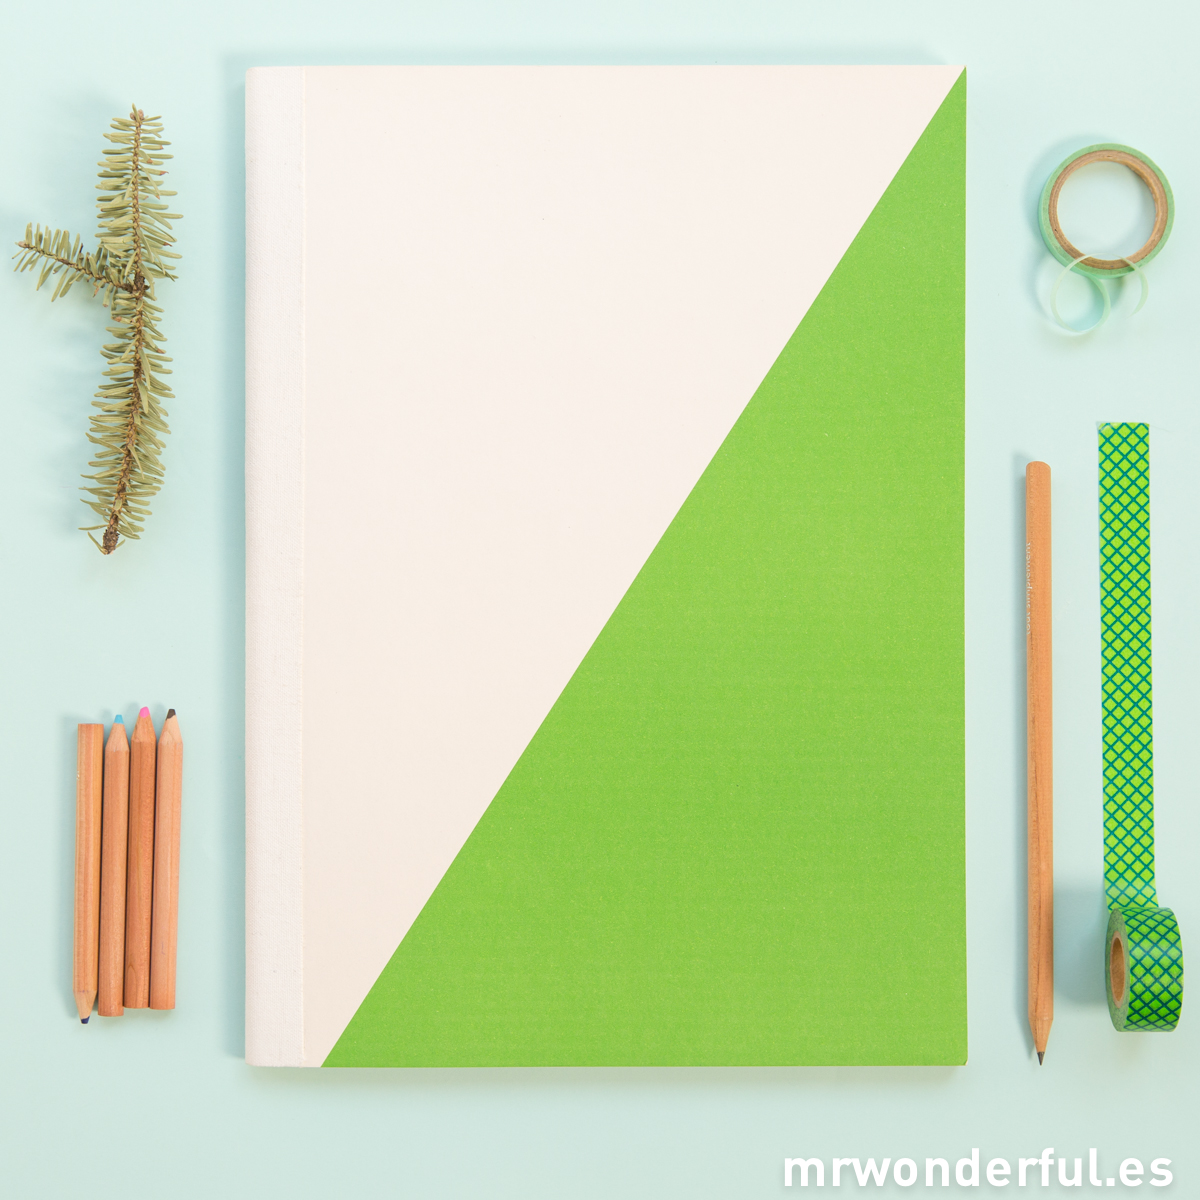 mrwonderful_SK0990_1_libreta-grande-blanco-verde-1